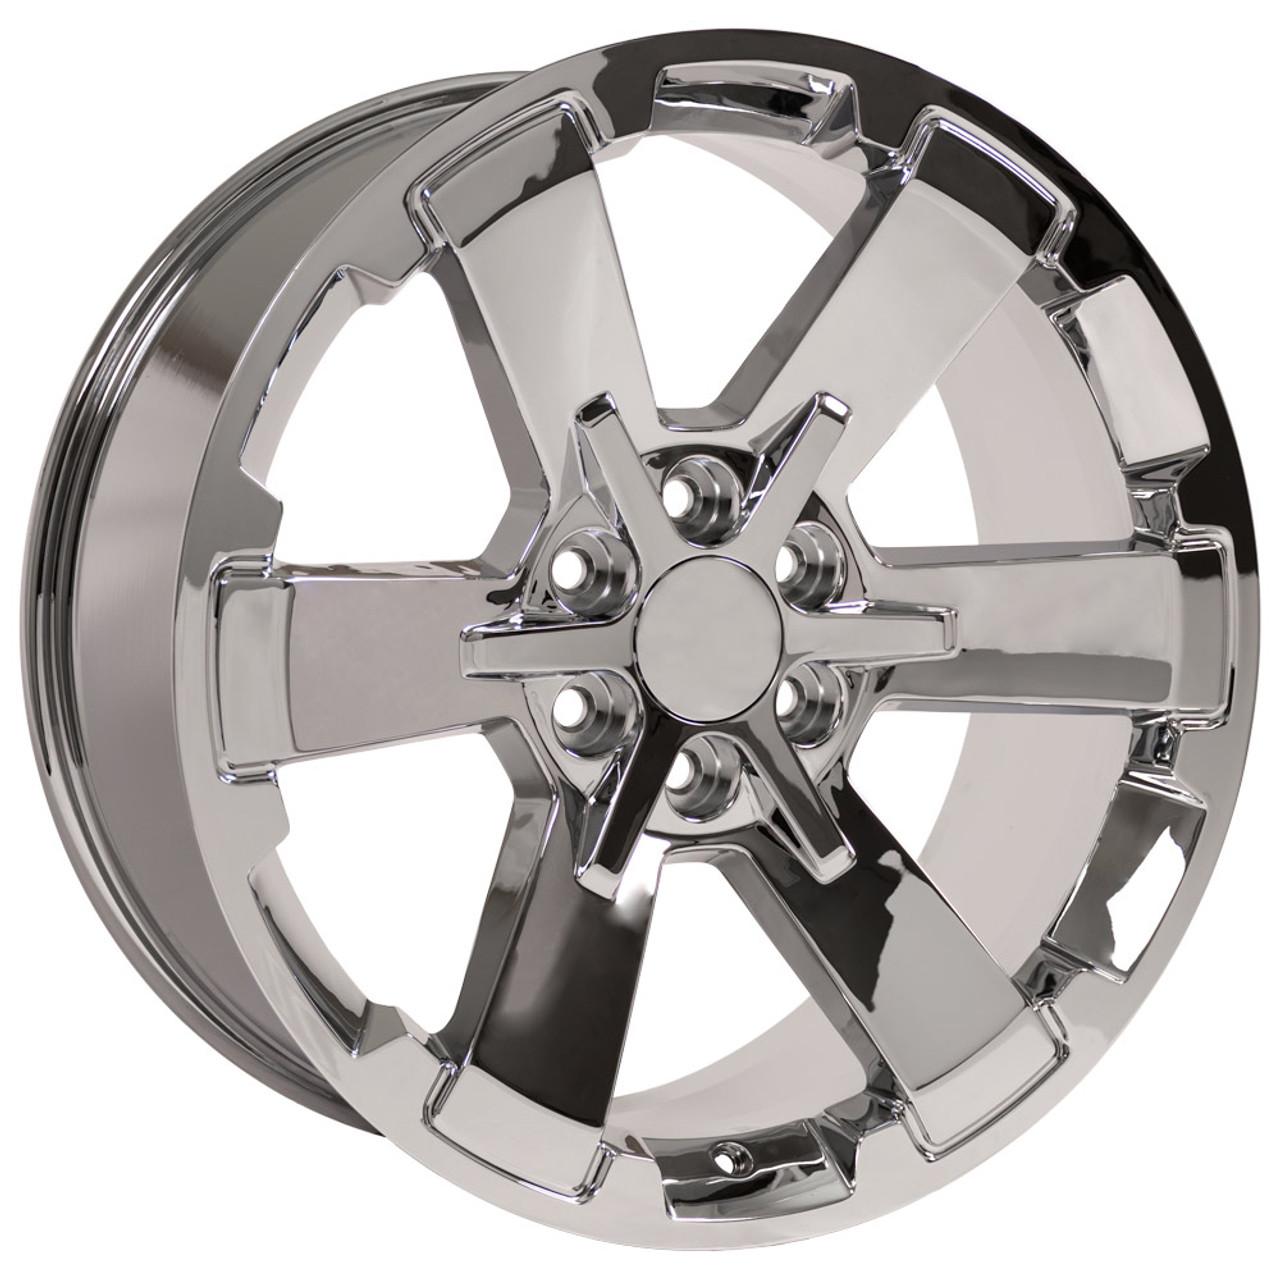 "22"" Fits Chevy 1500 Midnight Wheels Chrome Rally GMC Yukon"